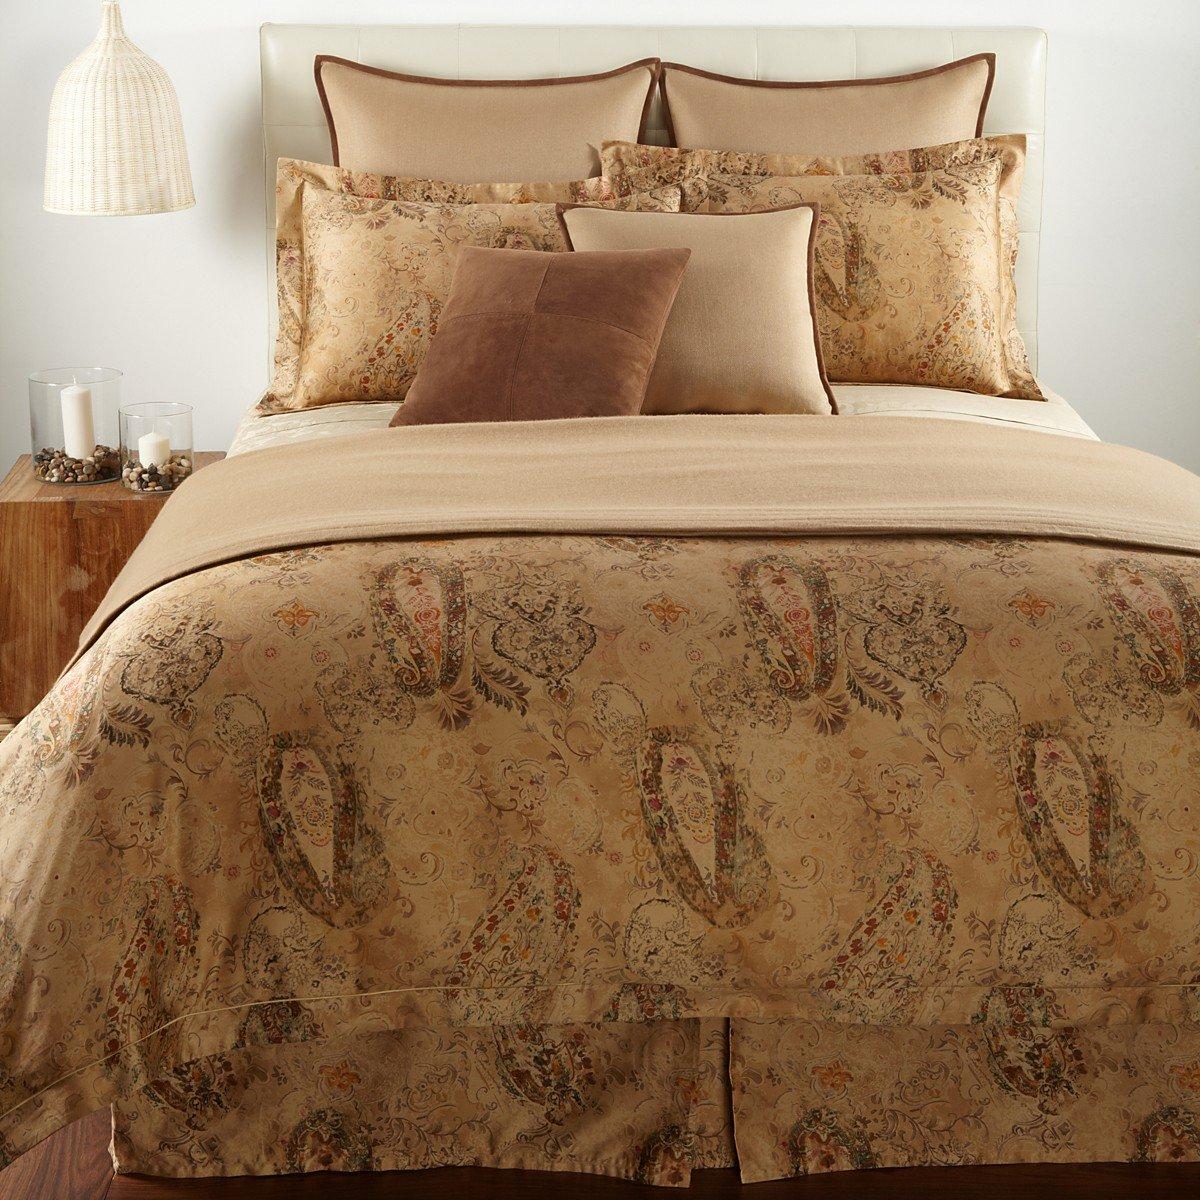 covers cover amazon ralph king indigo lauren home montauk duvet kitchen dp com